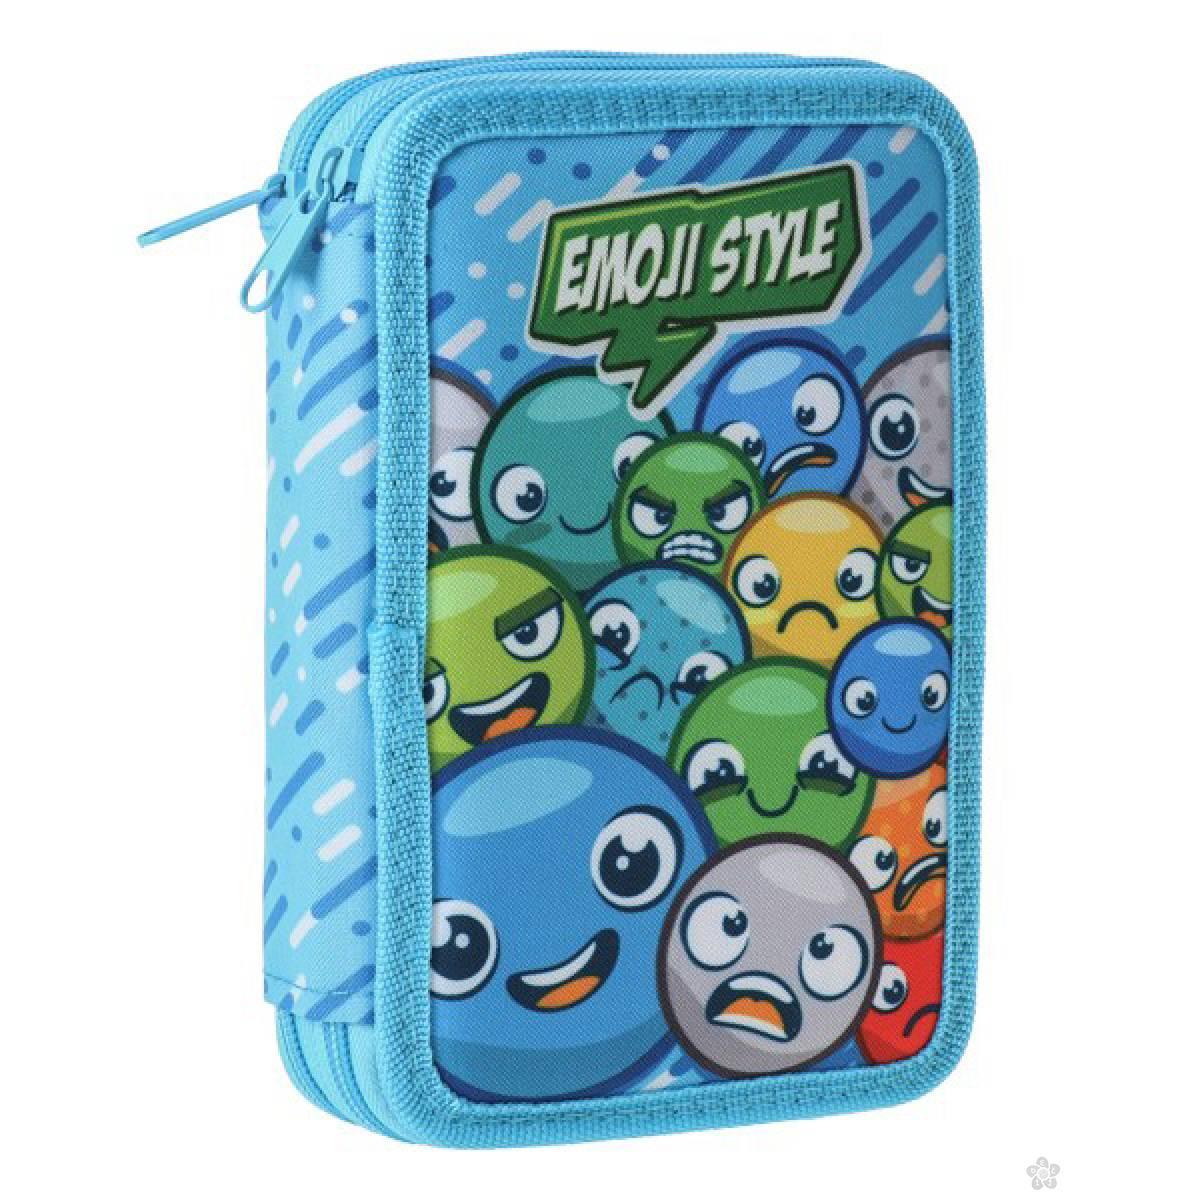 Pernica puna 2 zipa, Double Decker Emoji 100478